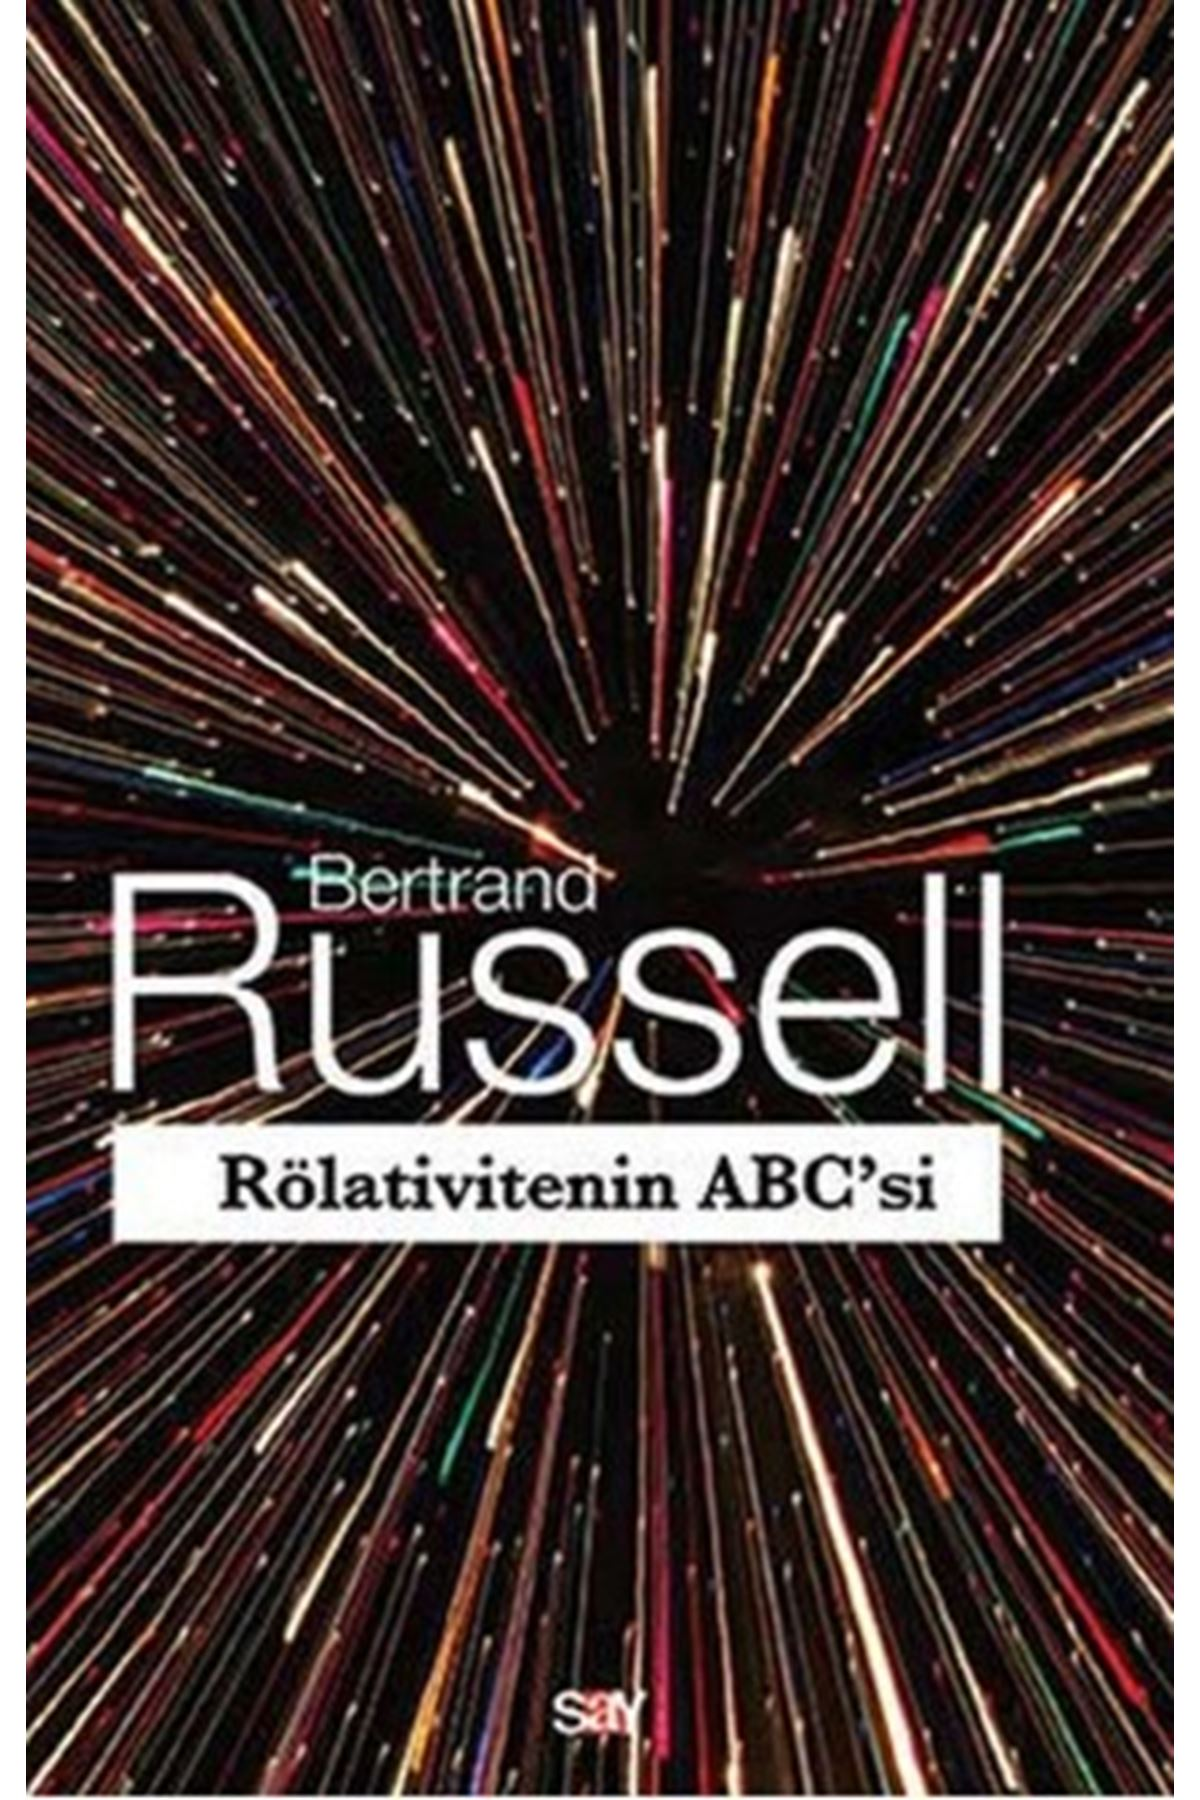 BERTRAND RUSSELL - RÖLATİVİTENİN ABC'Sİ